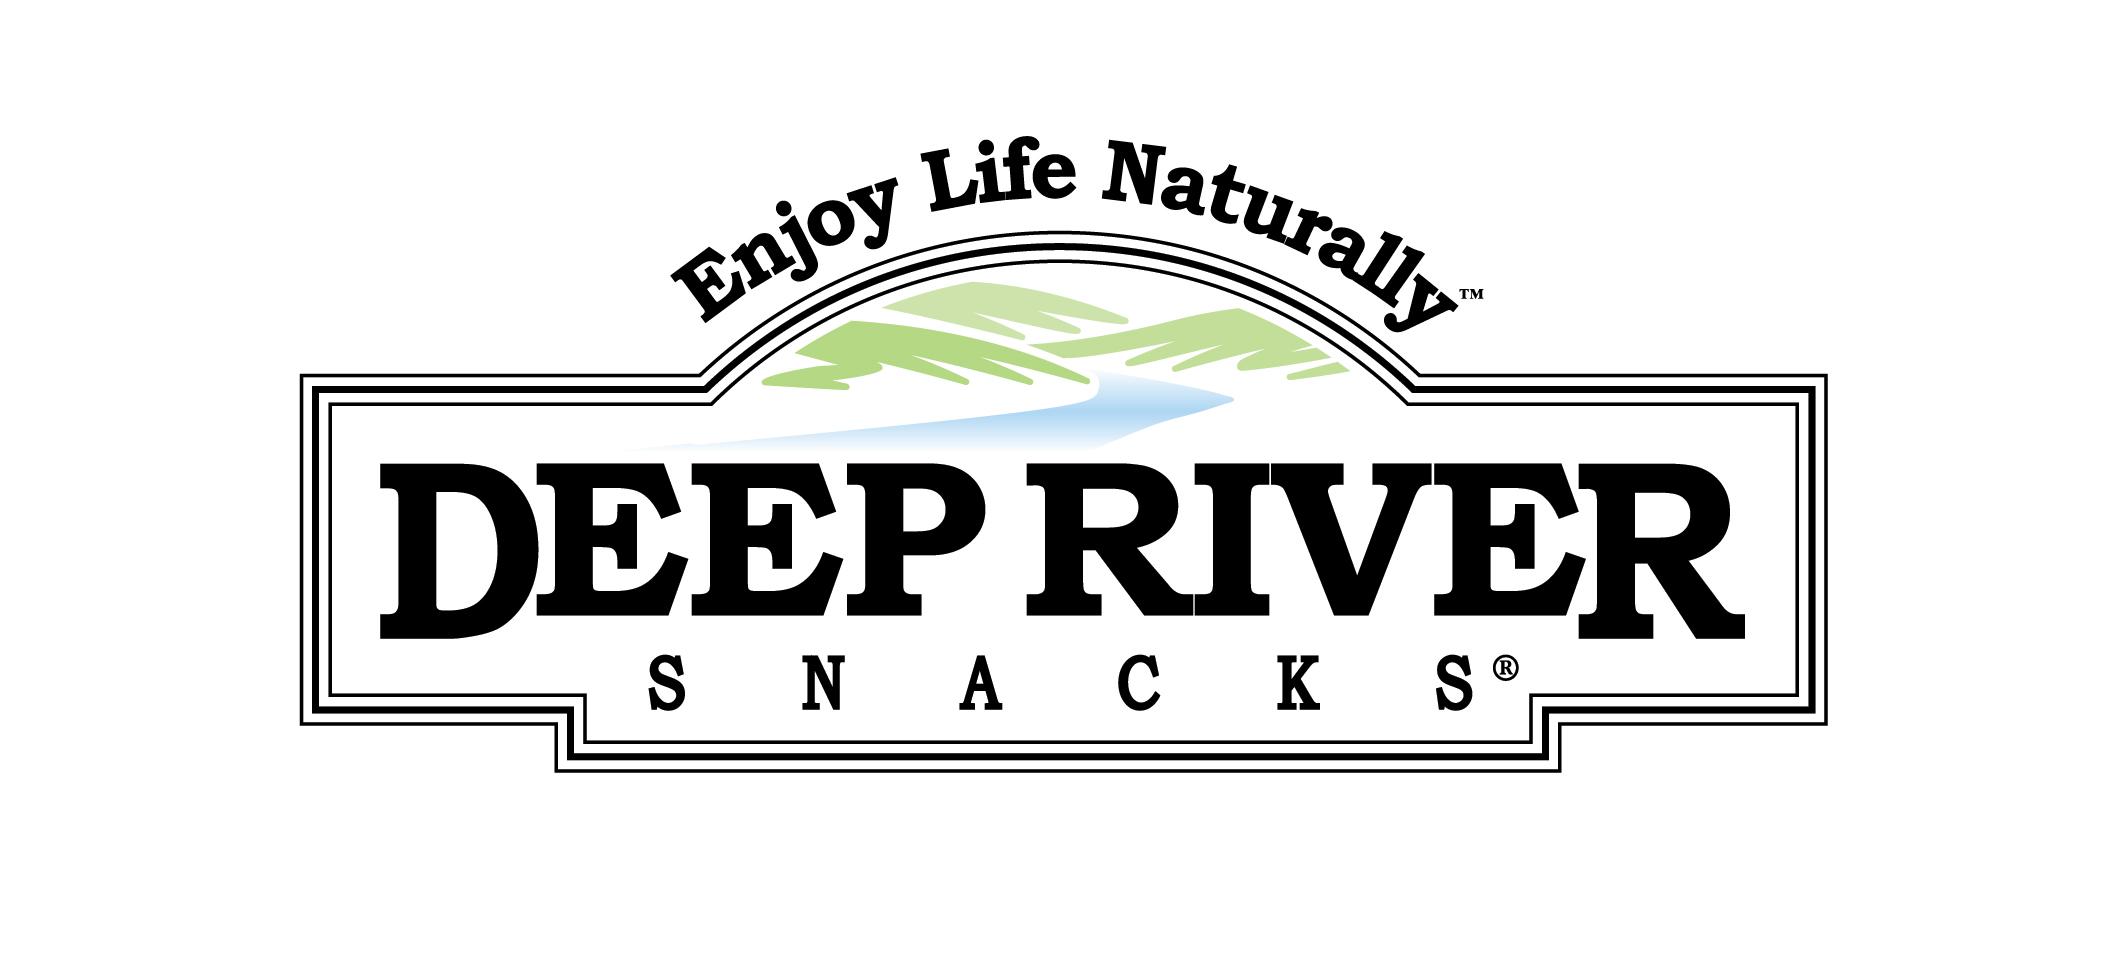 Deep River Snacks Logos Amp Brands Directory